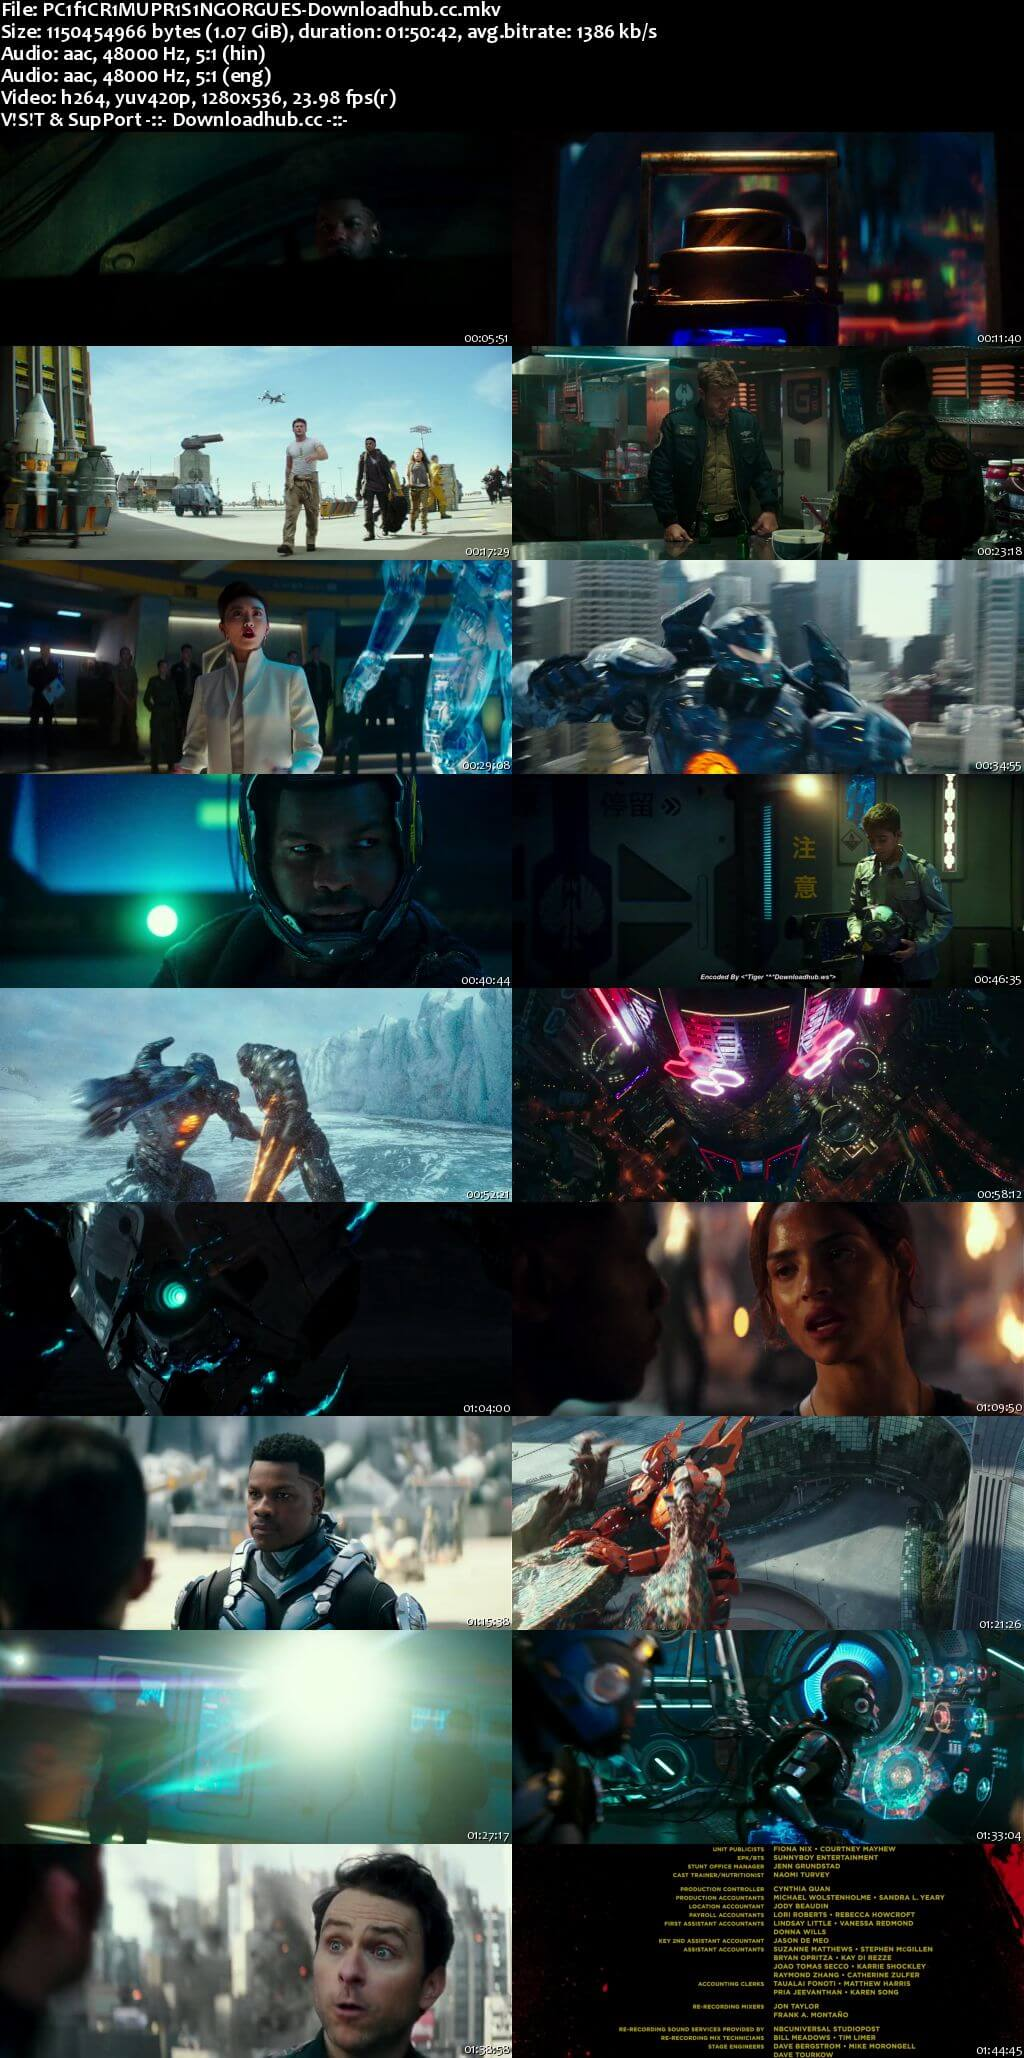 Pacific Rim Uprising 2018 Dual Audio 720p BluRay ORG [Hindi - English] ESubs